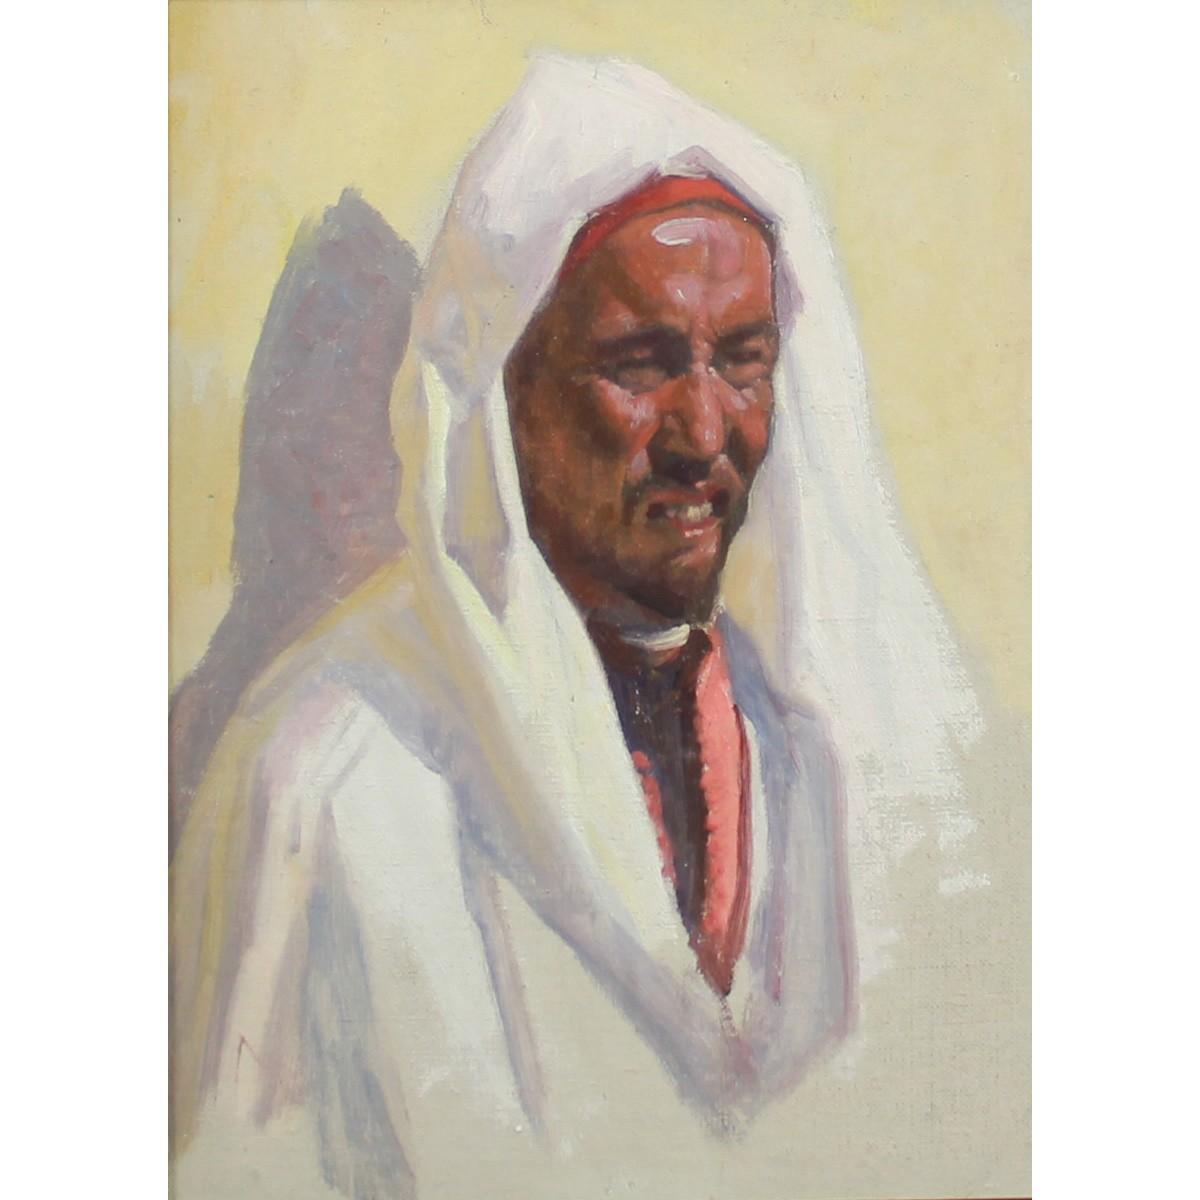 Lot 23 - Coutts, Gordon 1868-1937 Scottish AR, Portrait of an Arab Man.